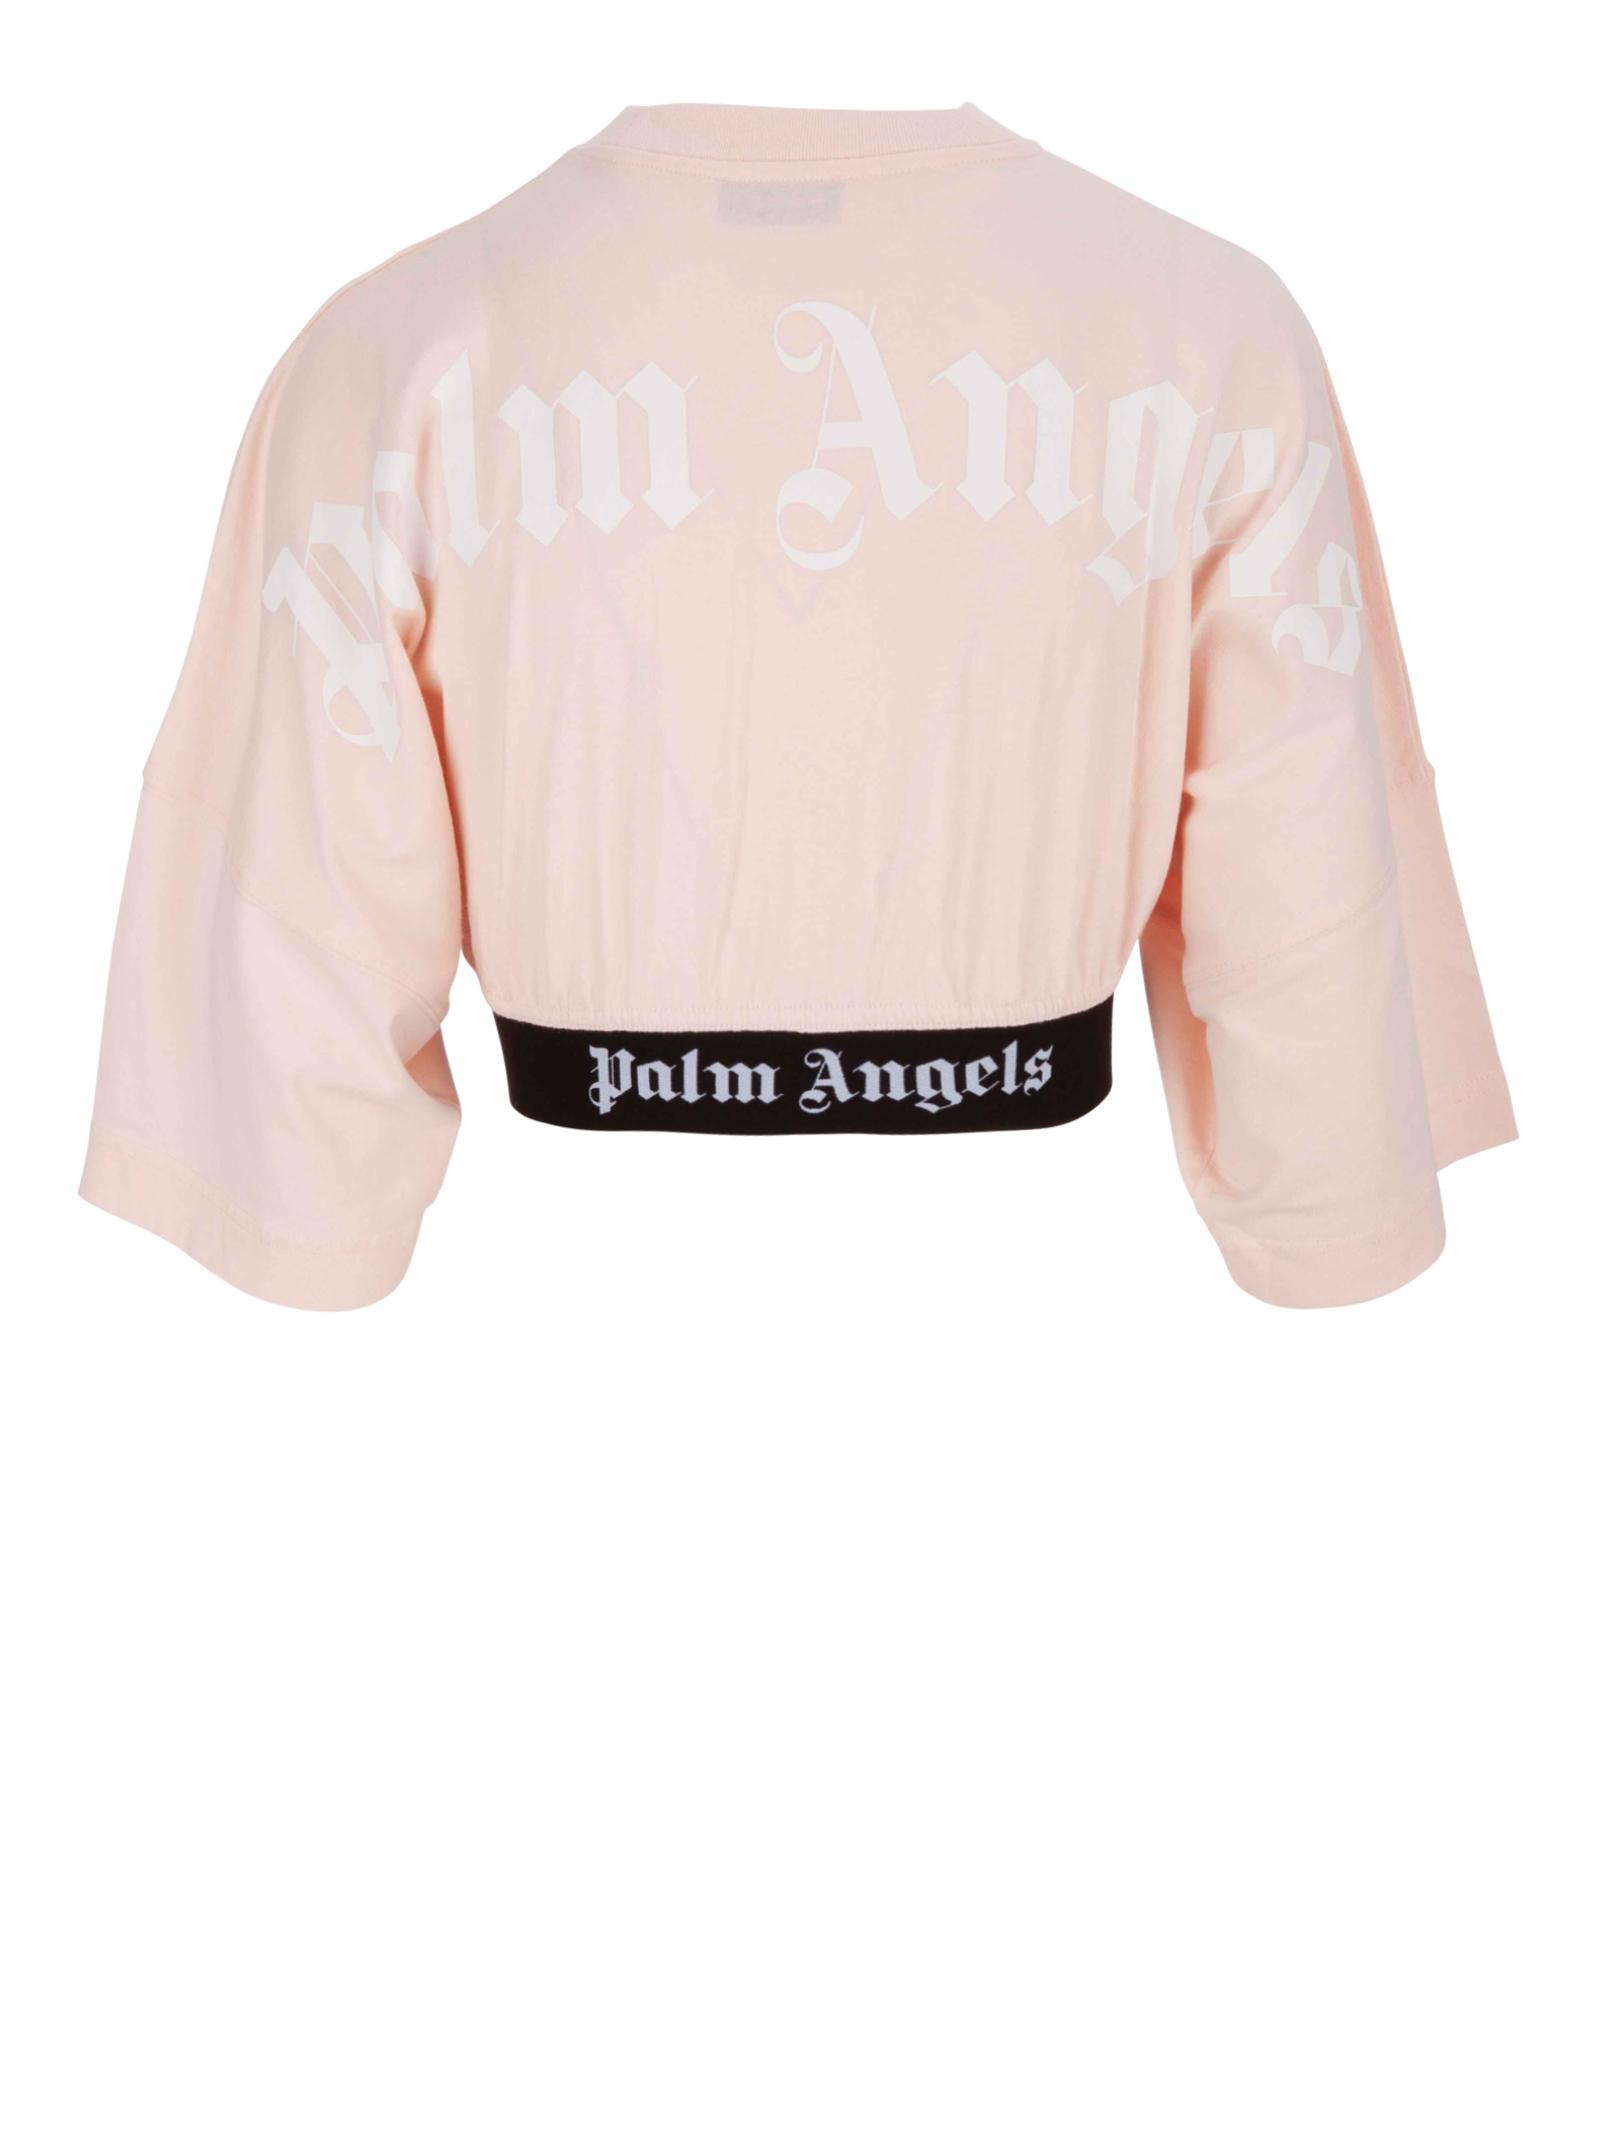 7088e4e64e Palm Angels t-shirt - Palm Angels - Michele Franzese Moda